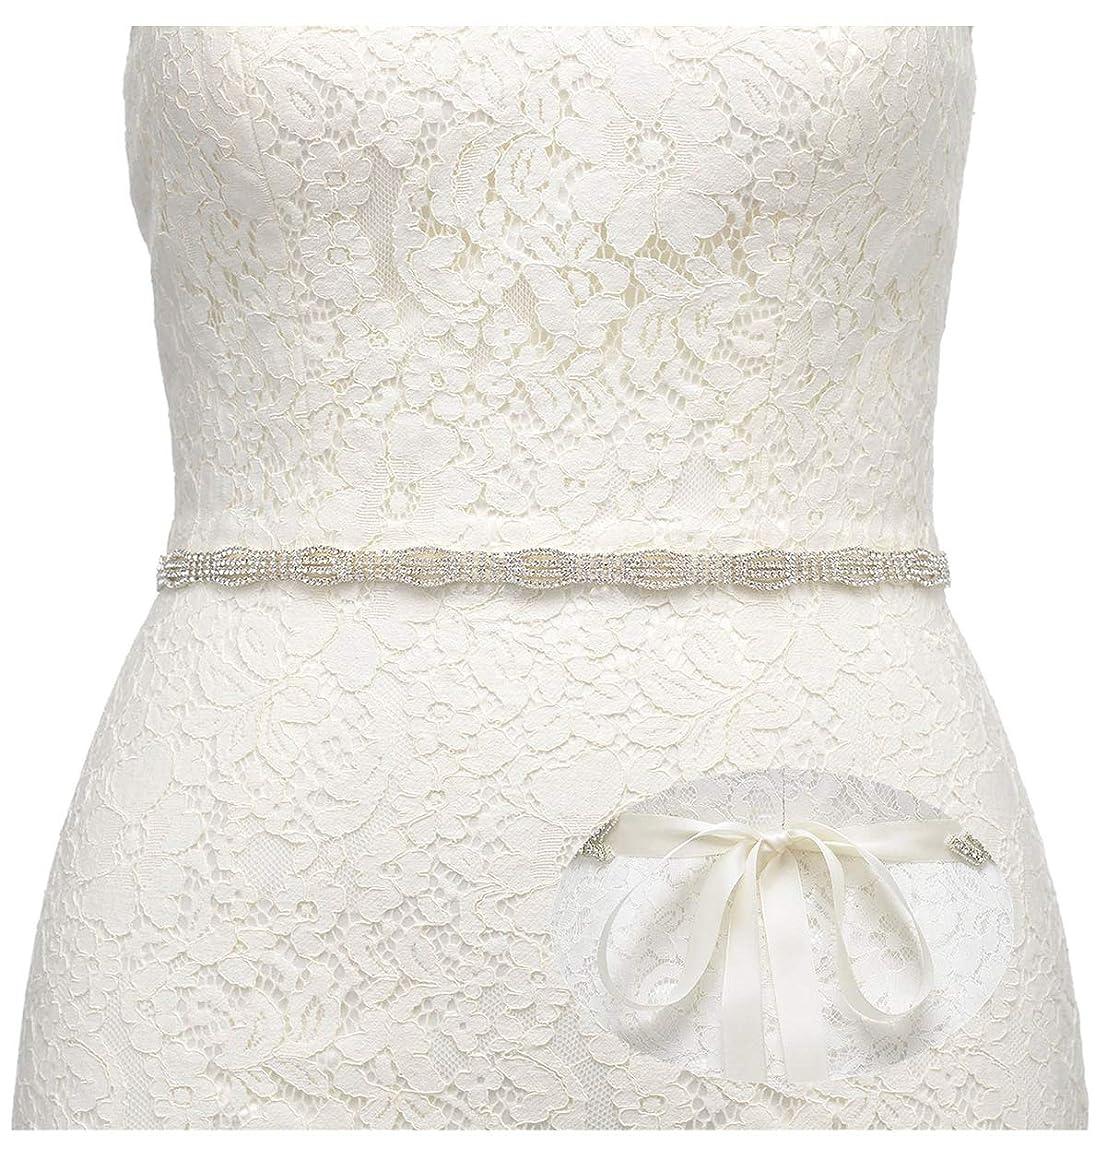 SWEETV Rhinestone Bridal Belt Wedding Dress Belt Crystal Headband Bride Bridesmaids Sash Belt, Silver